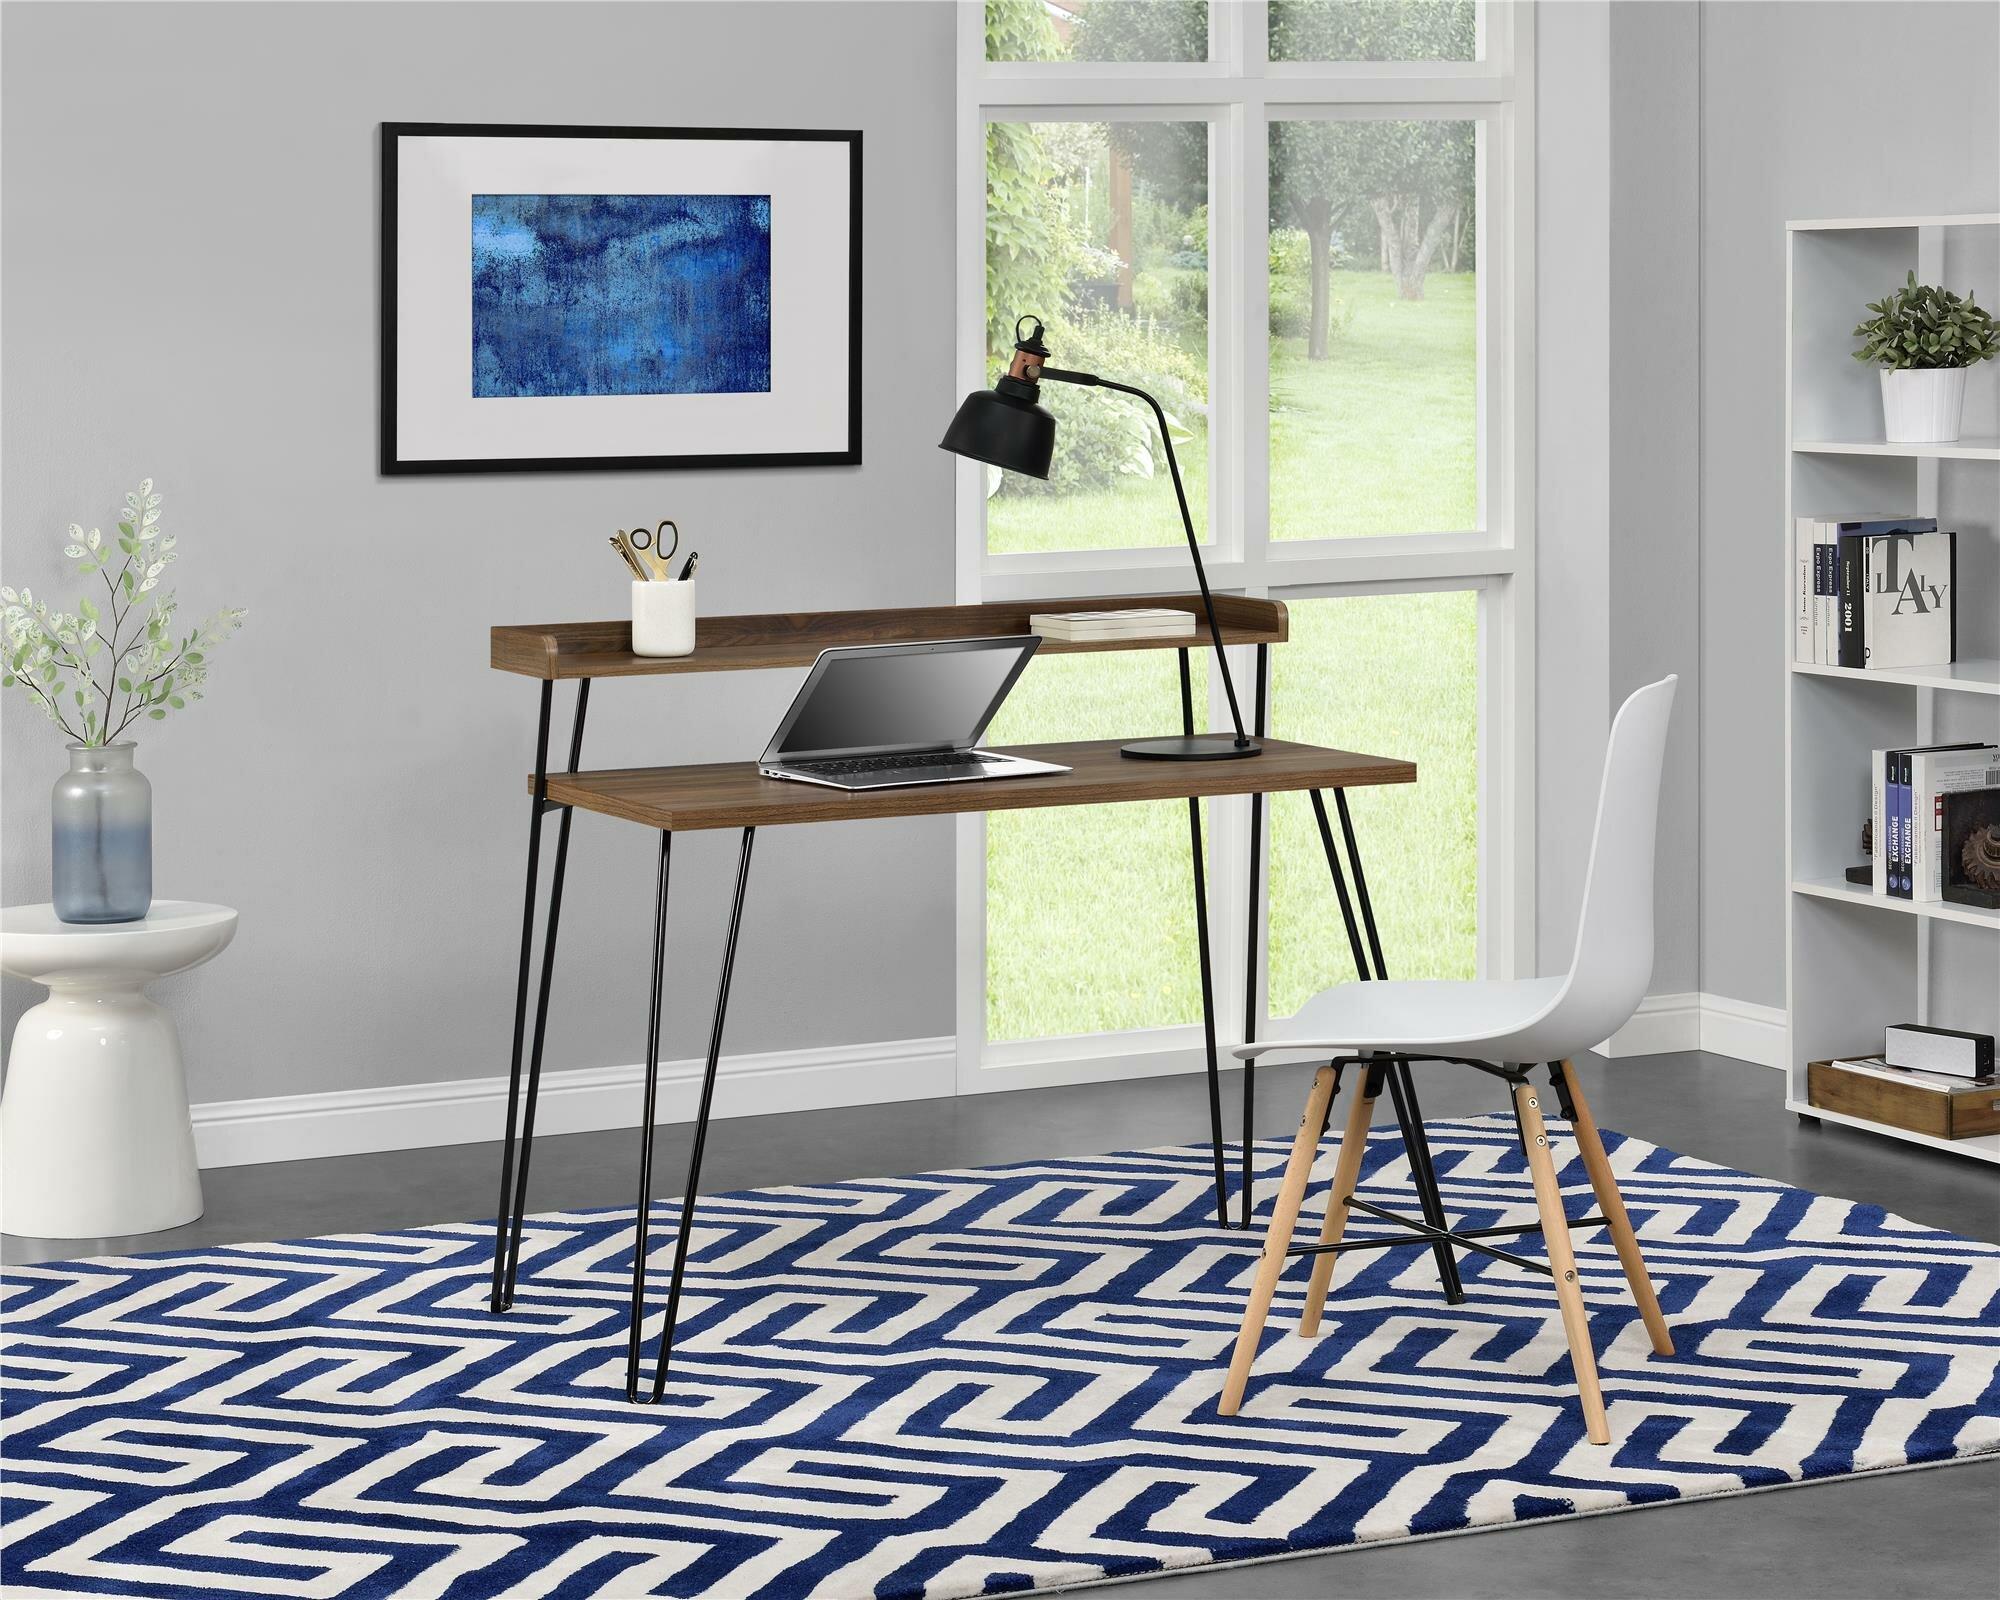 90+ Desks   FREE Shipping Over $12   Wayfair